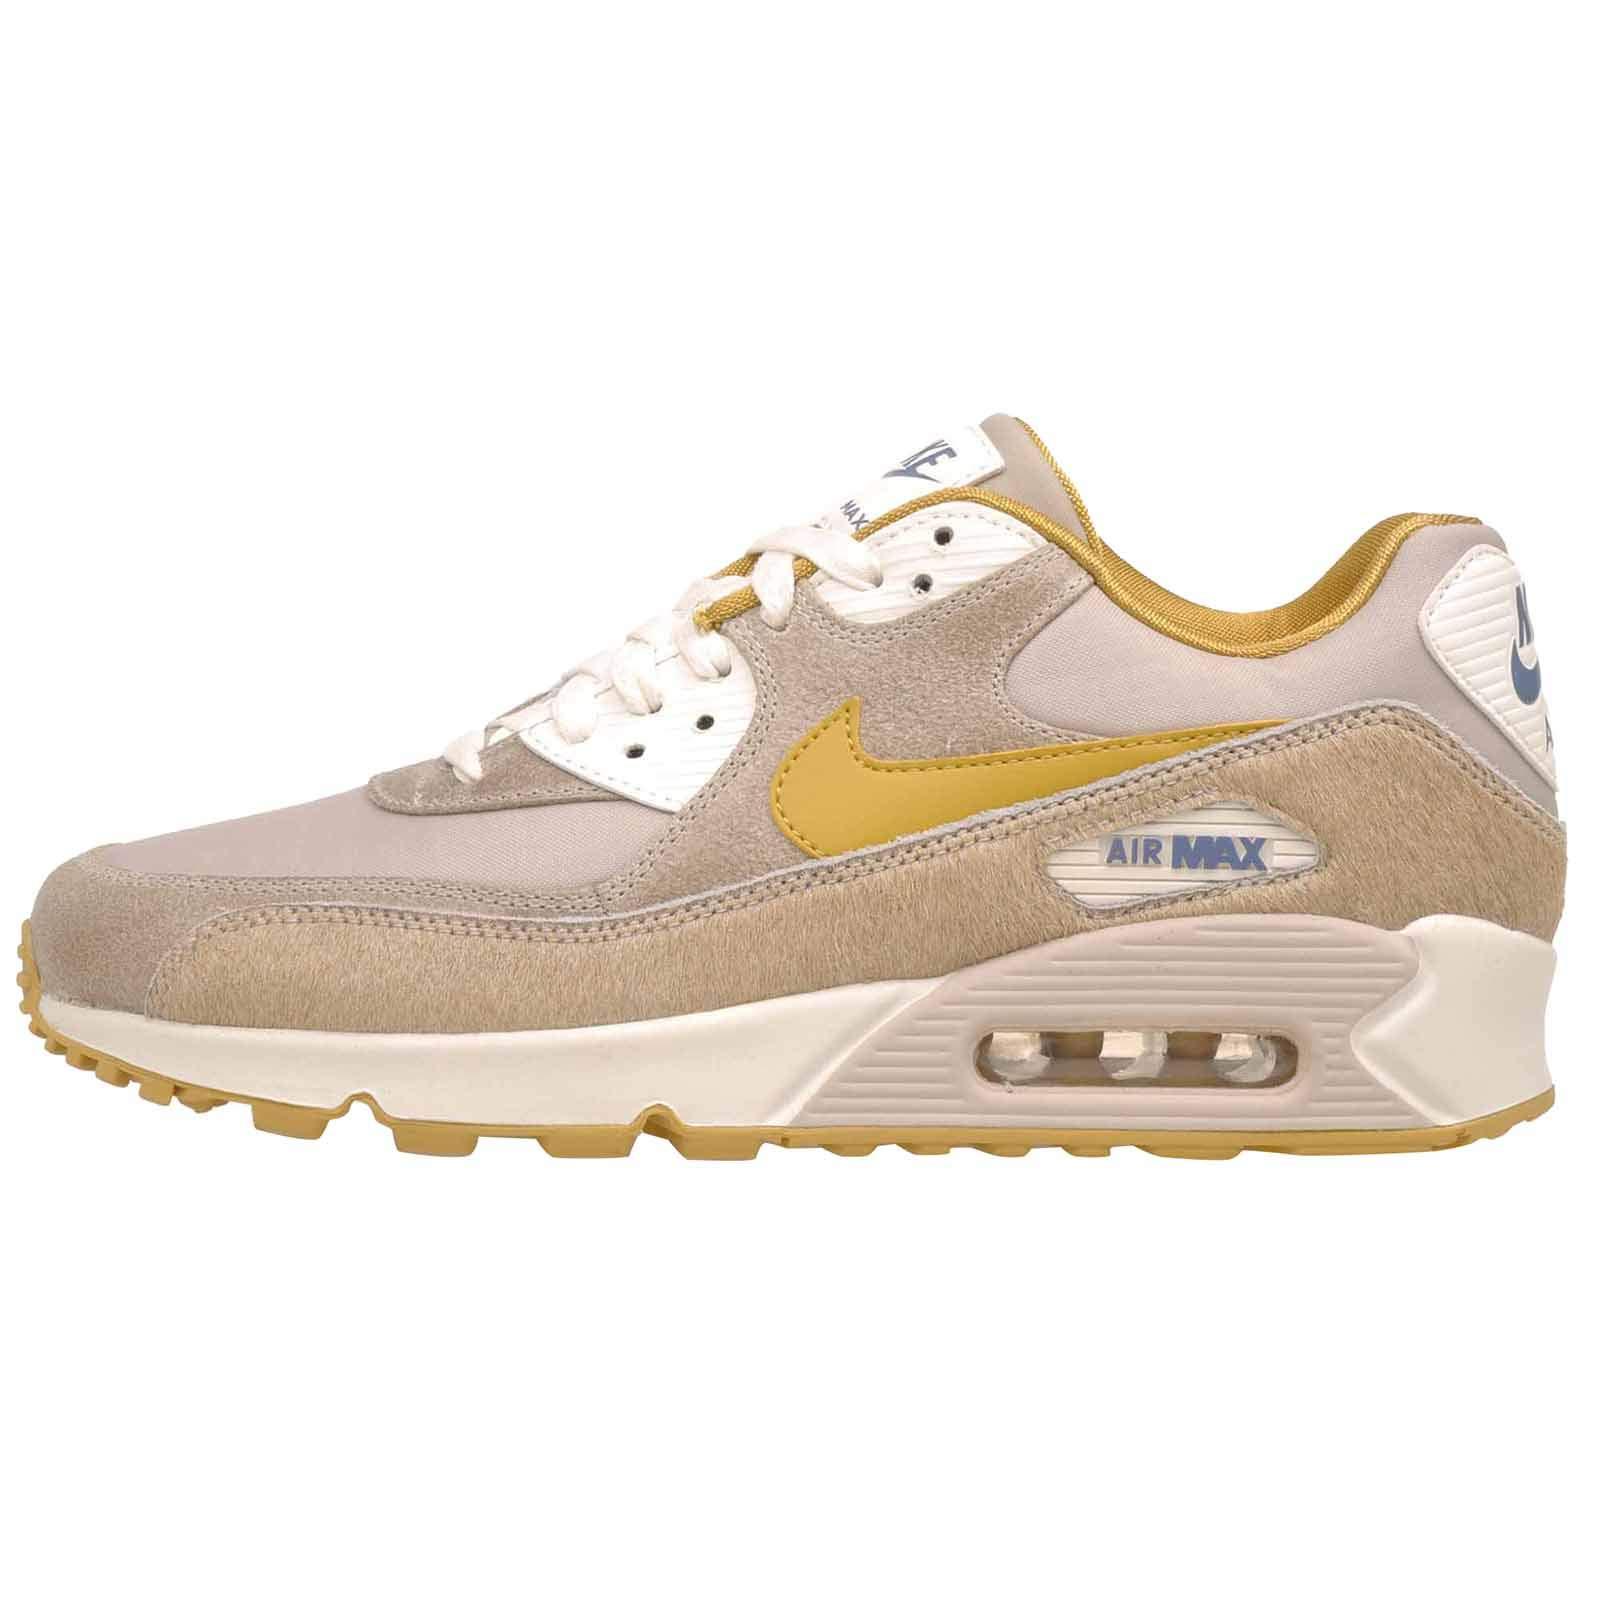 df3754dec4 Galleon - Nike Women's Air Max 90 Wheat Gold-Sail Ficelle AT4968-200 (Size:  8)